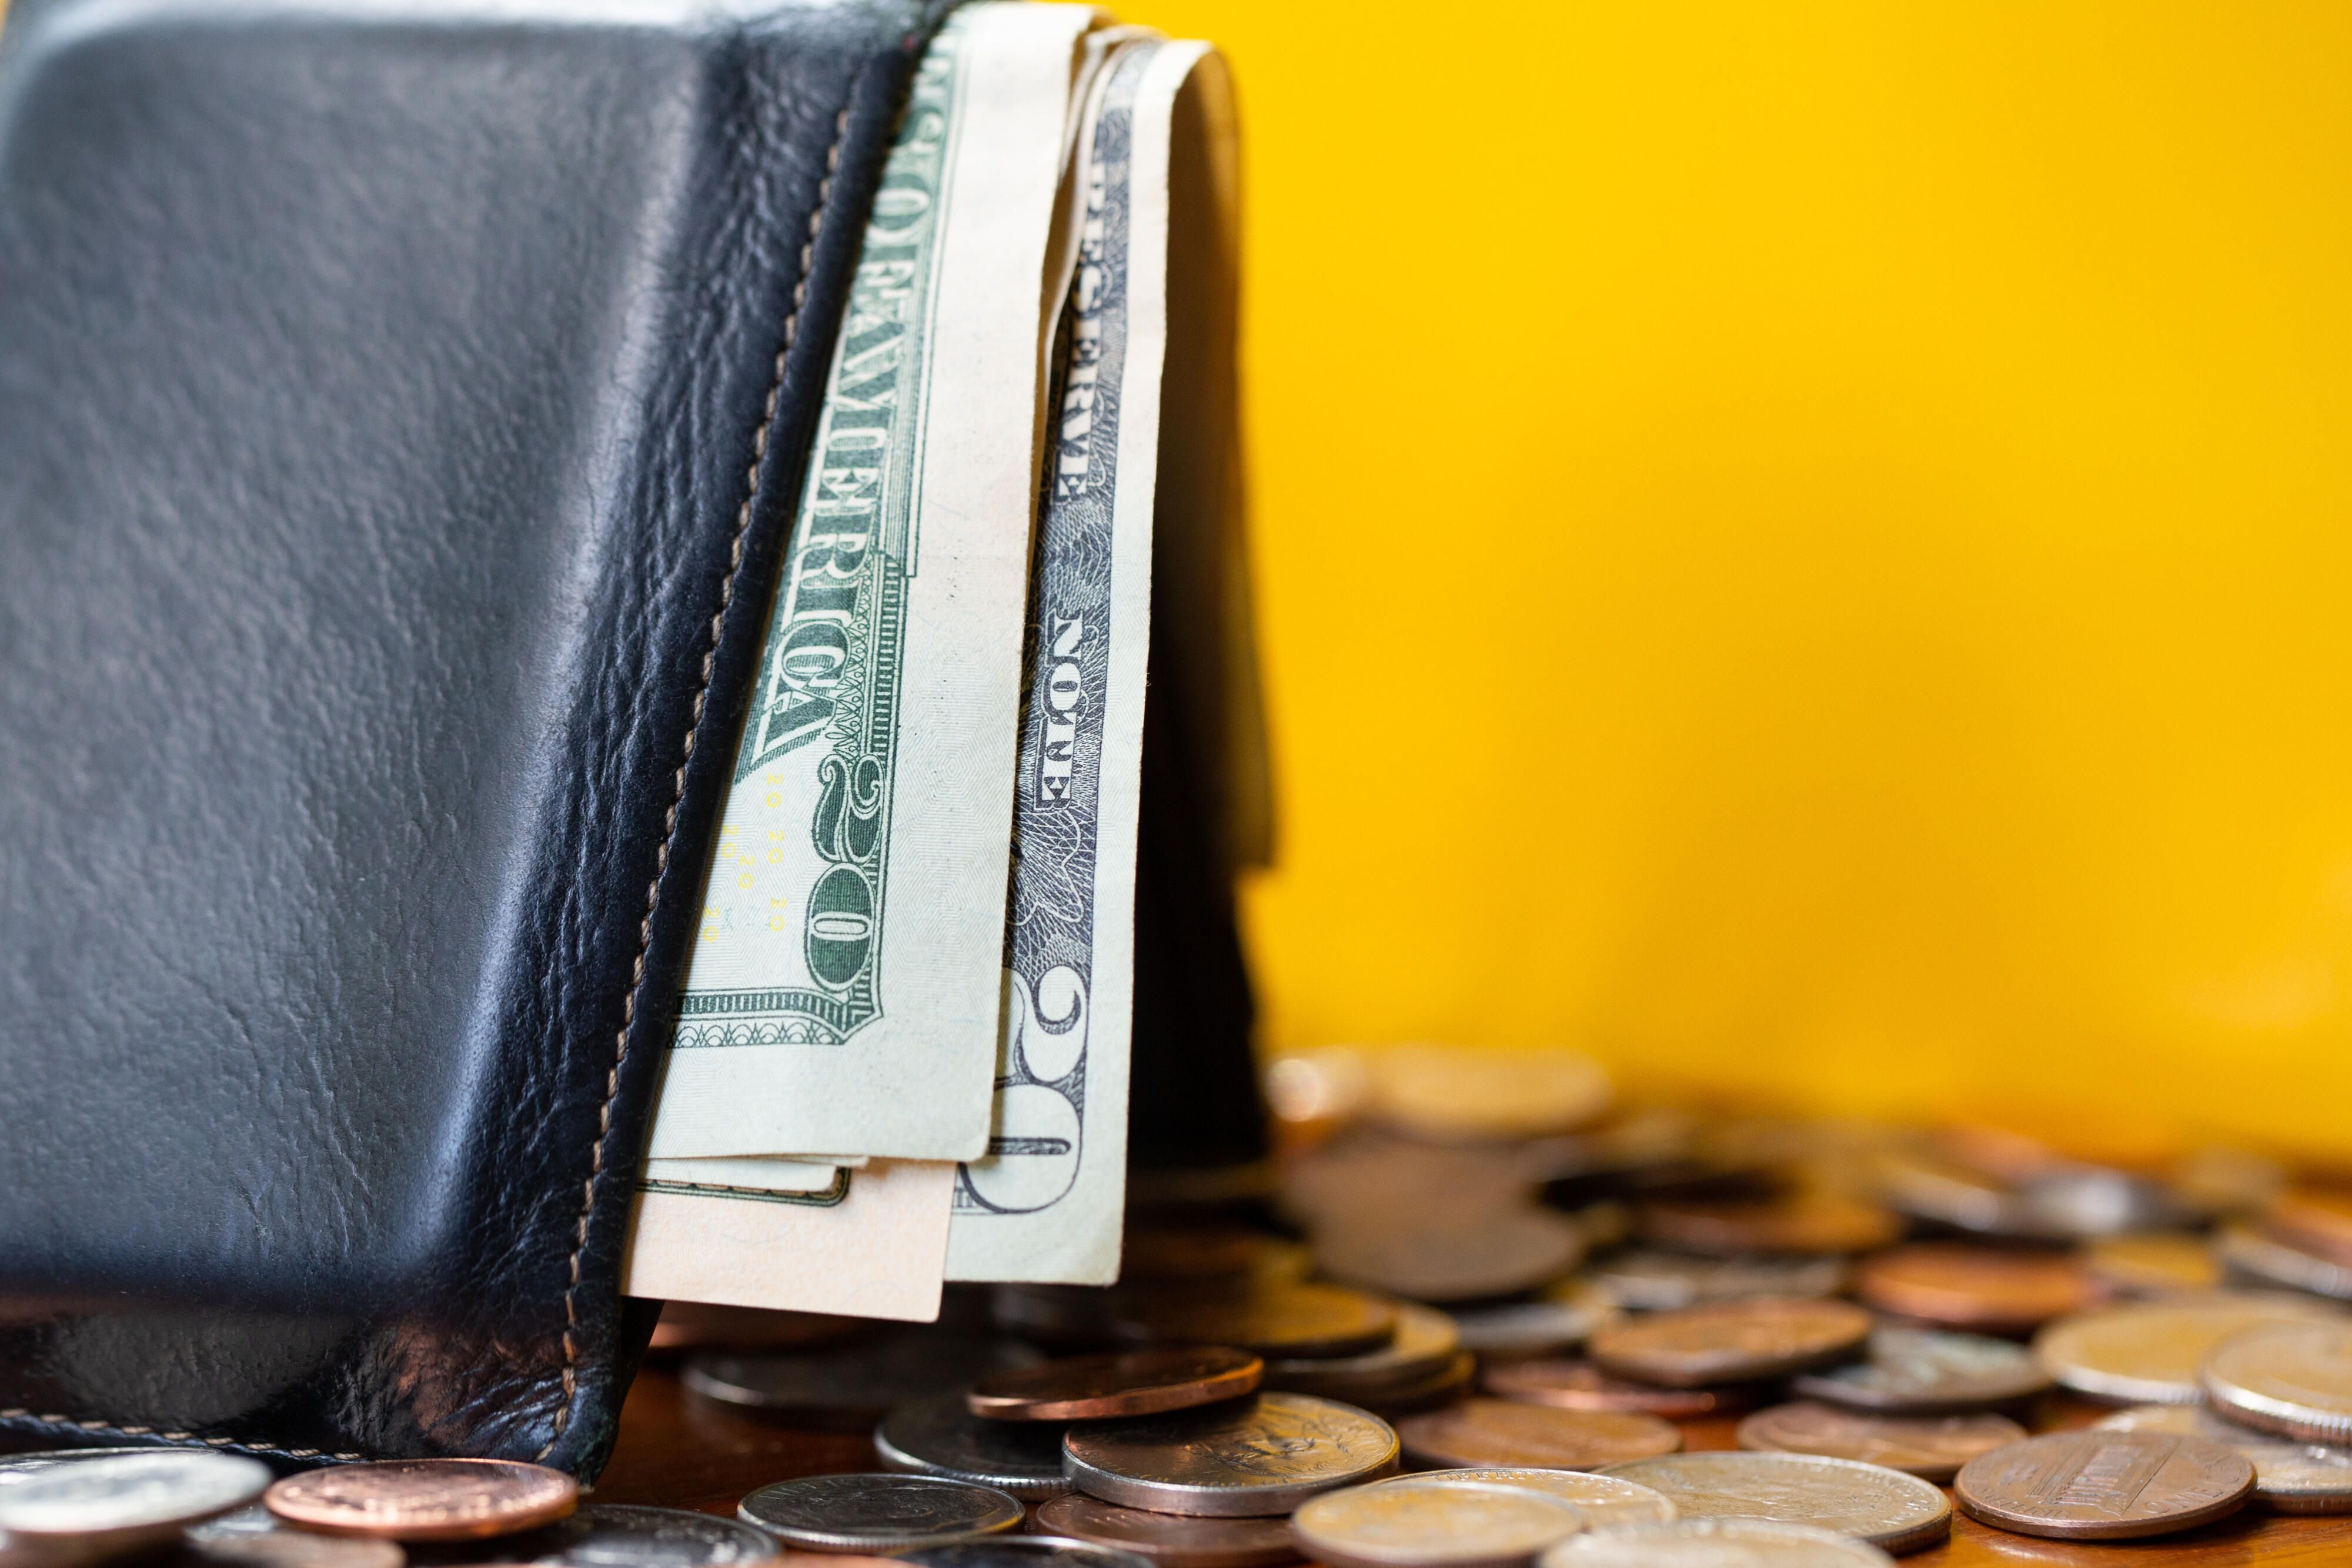 money-bills-wallet-coins-dollars-1002